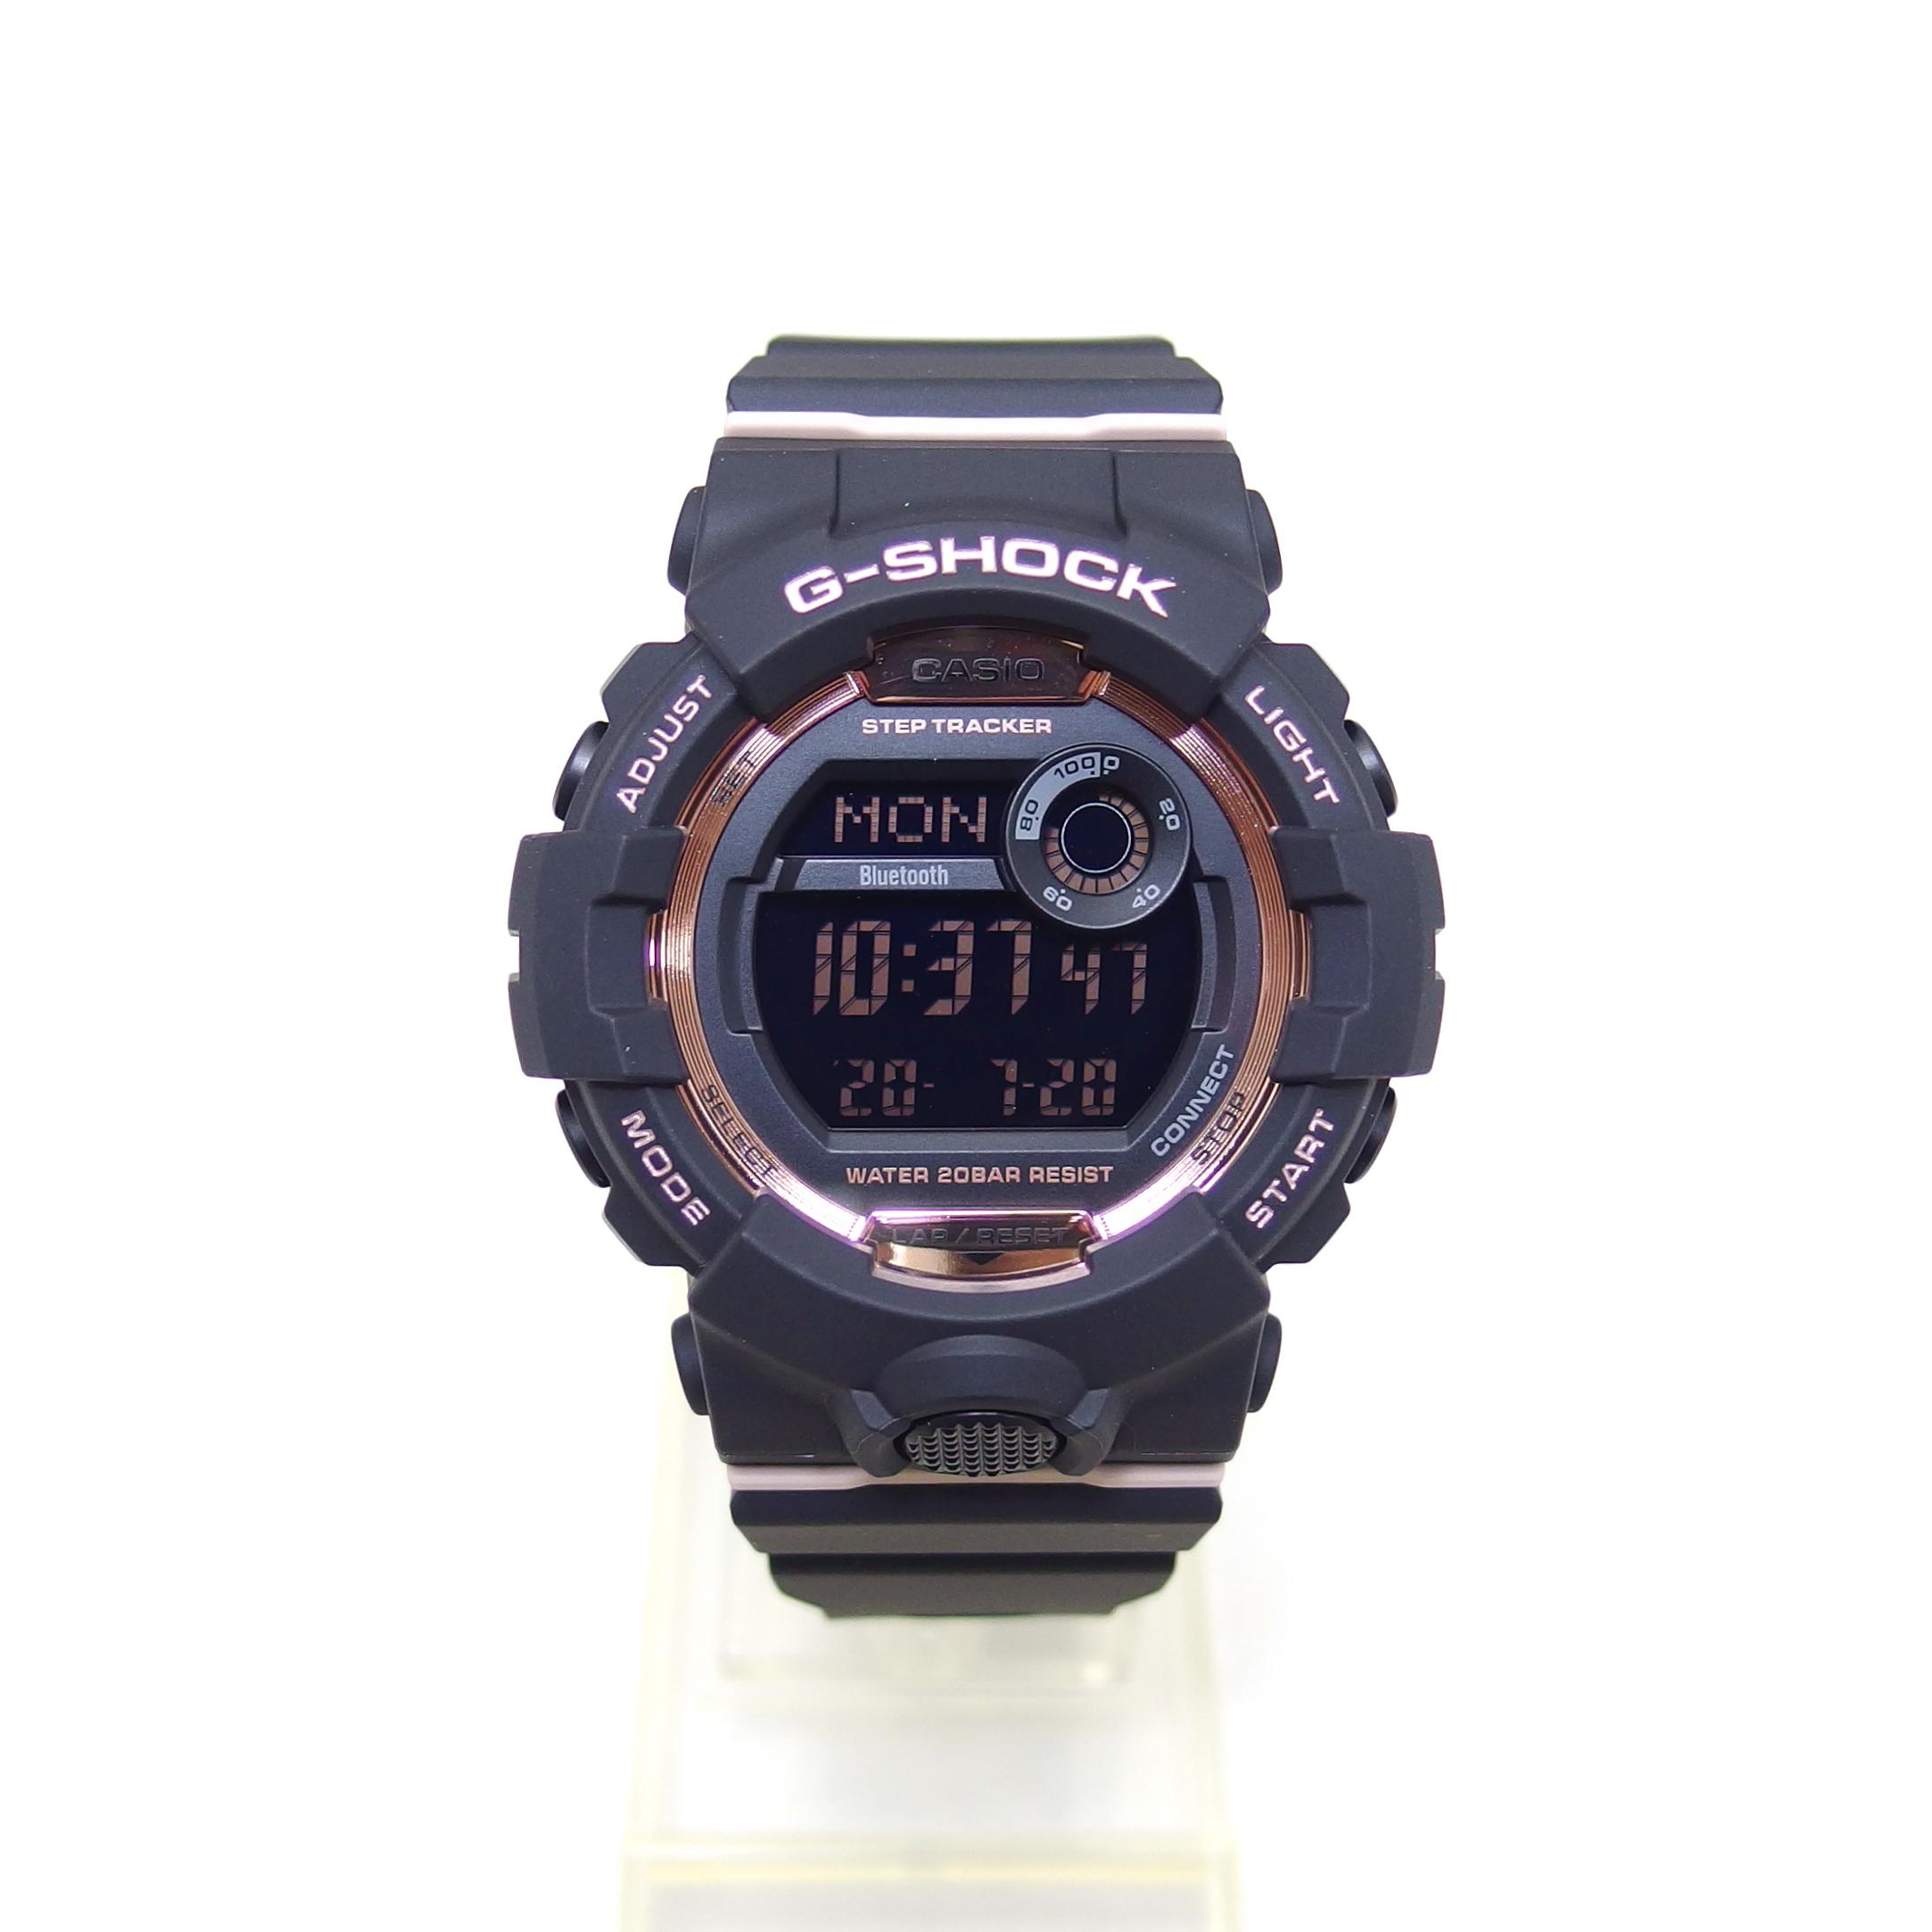 【G-SHOCK】GMD-B800-1JF (Bluetooth通信モデル)